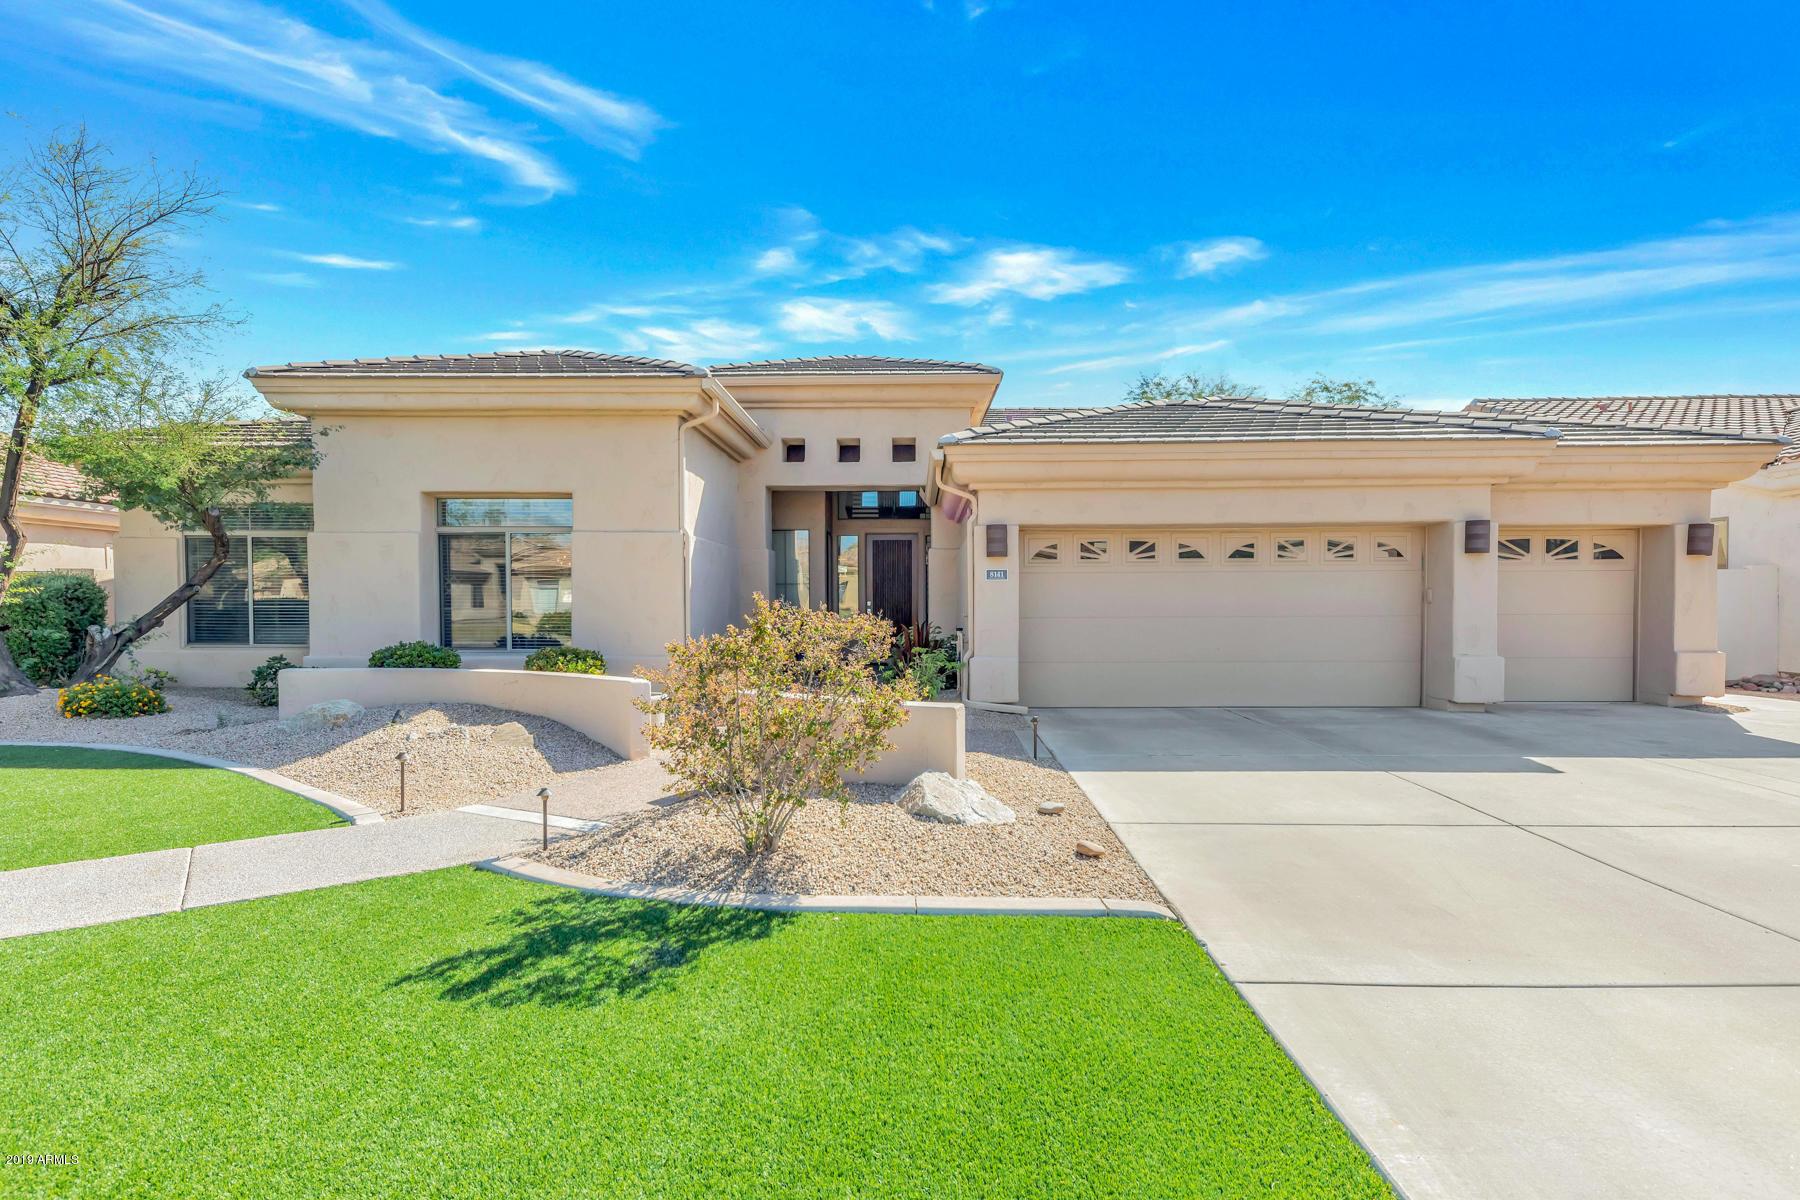 Photo of 8141 E CLINTON Street, Scottsdale, AZ 85260